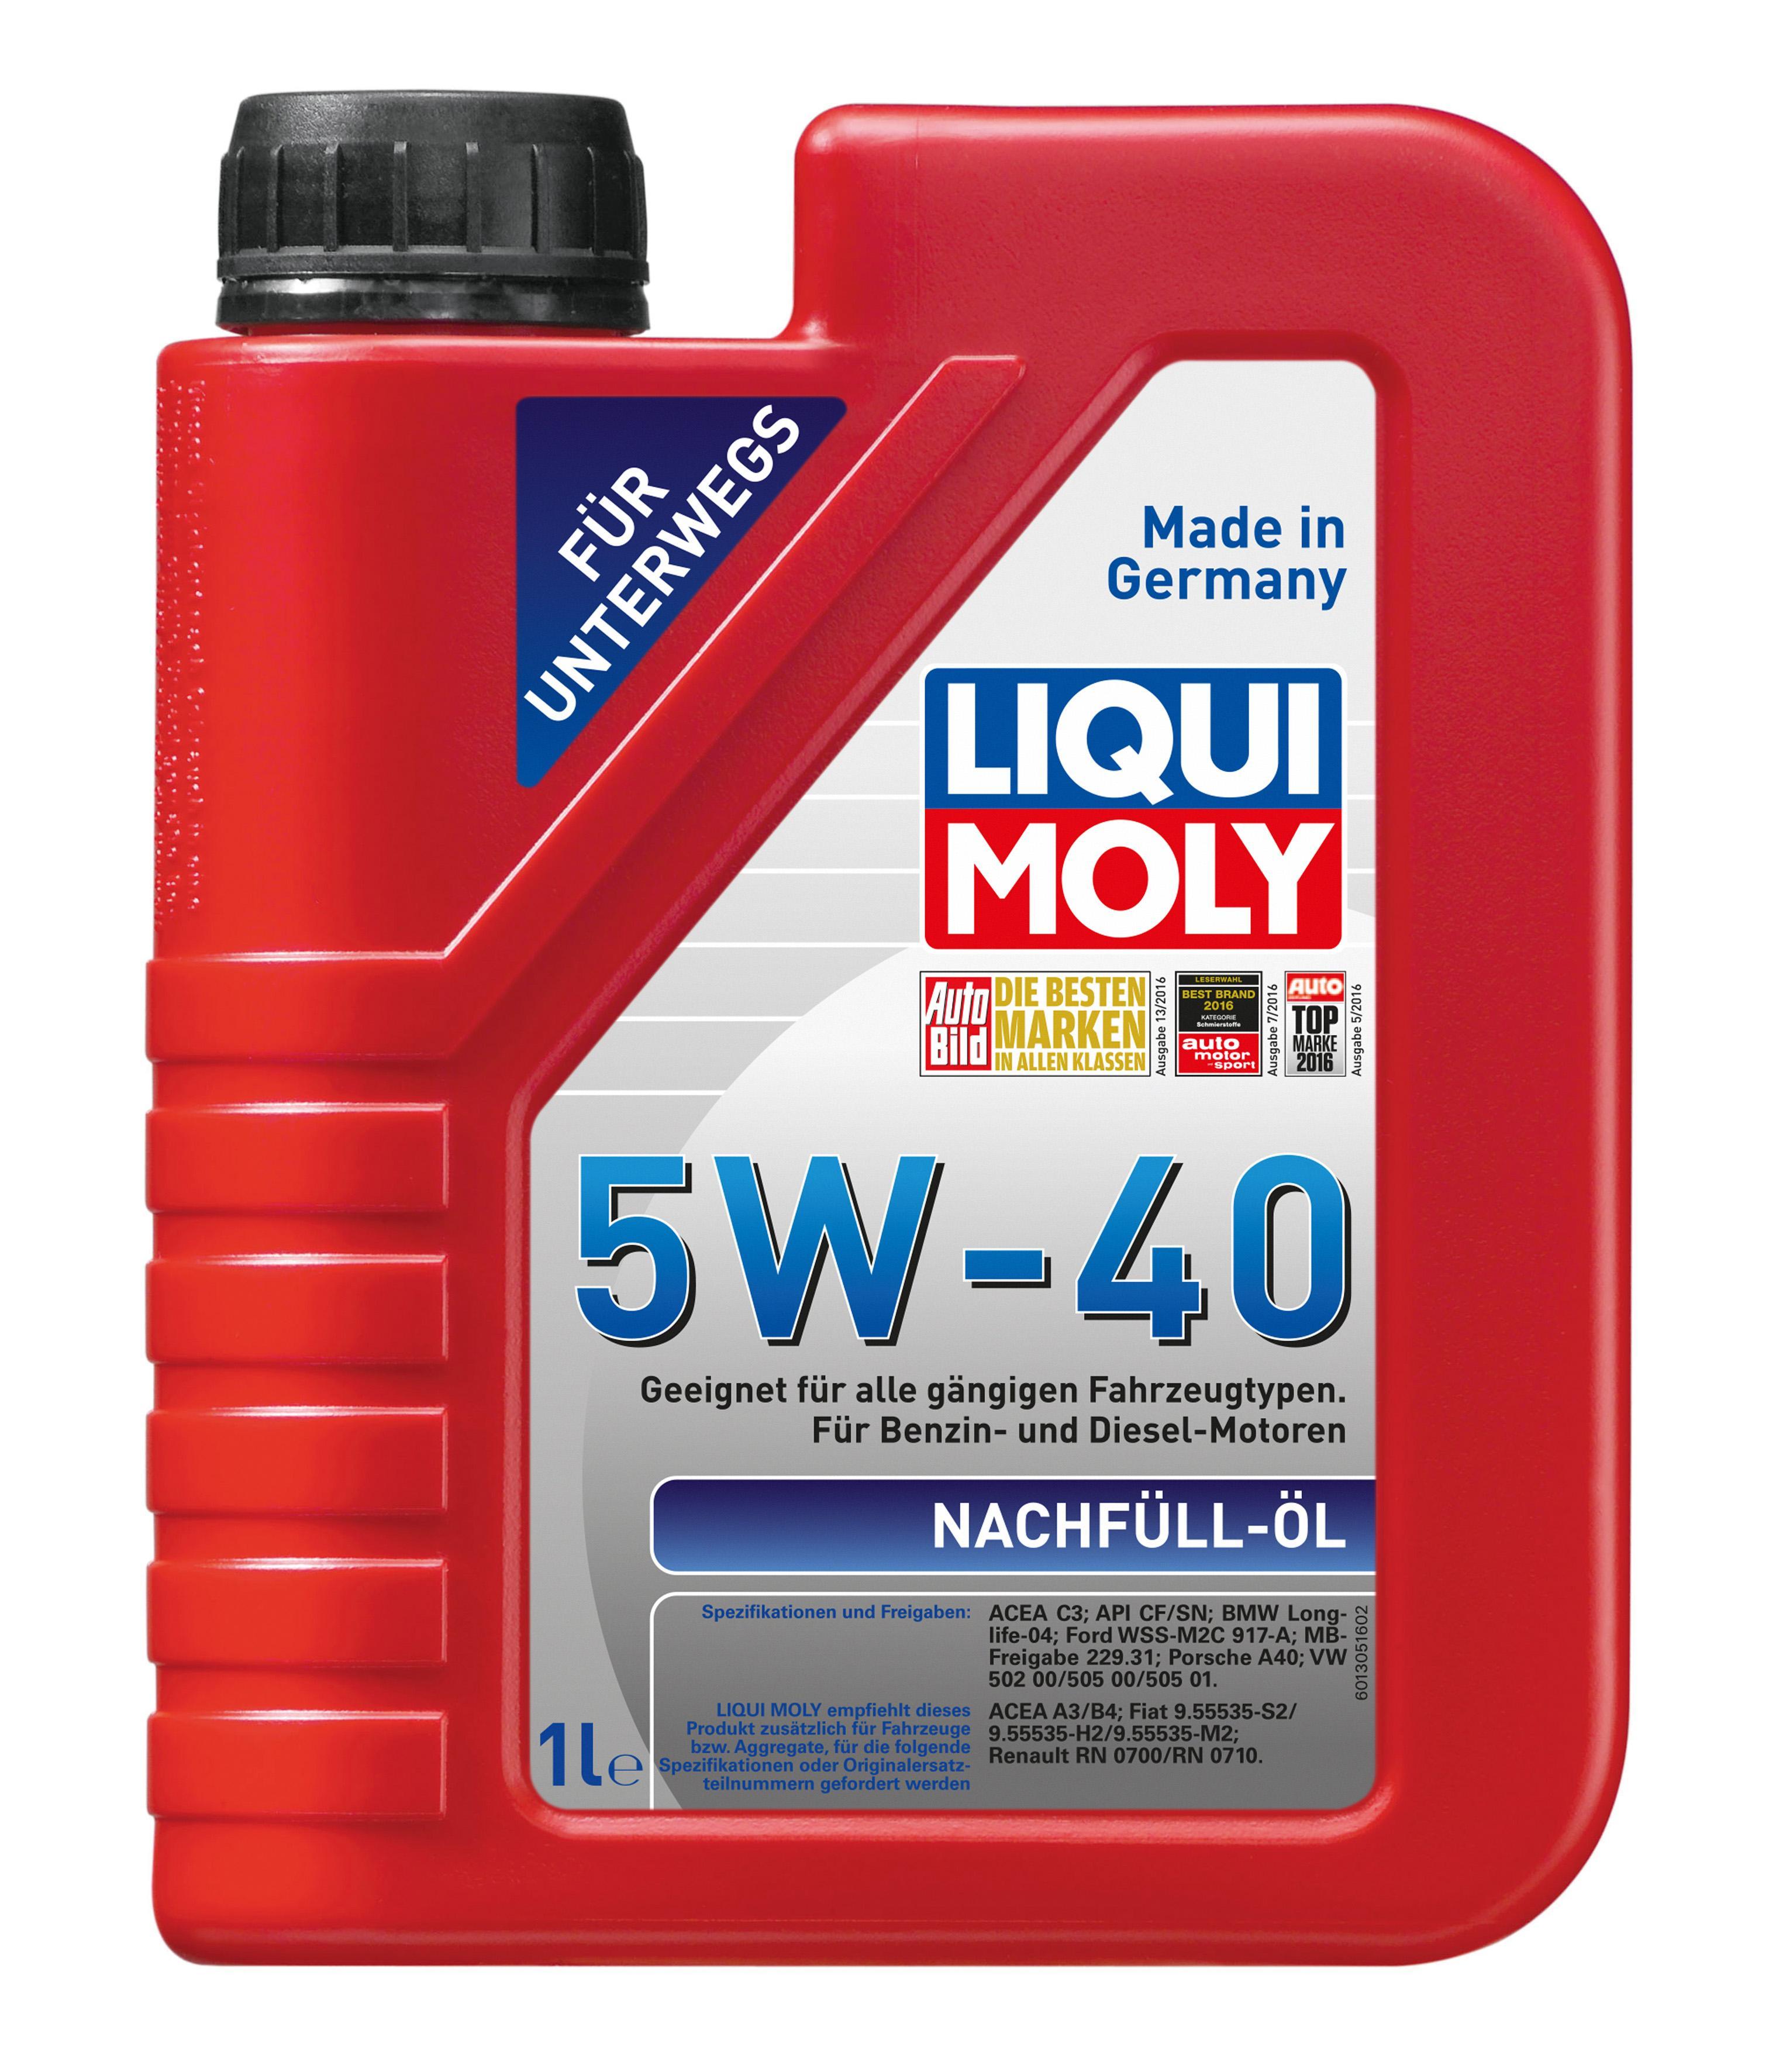 NachfllÖl5W40 LIQUI MOLY Nachfuell-oel 5W-40, 1l, Synthetiköl Motoröl 1305 günstig kaufen